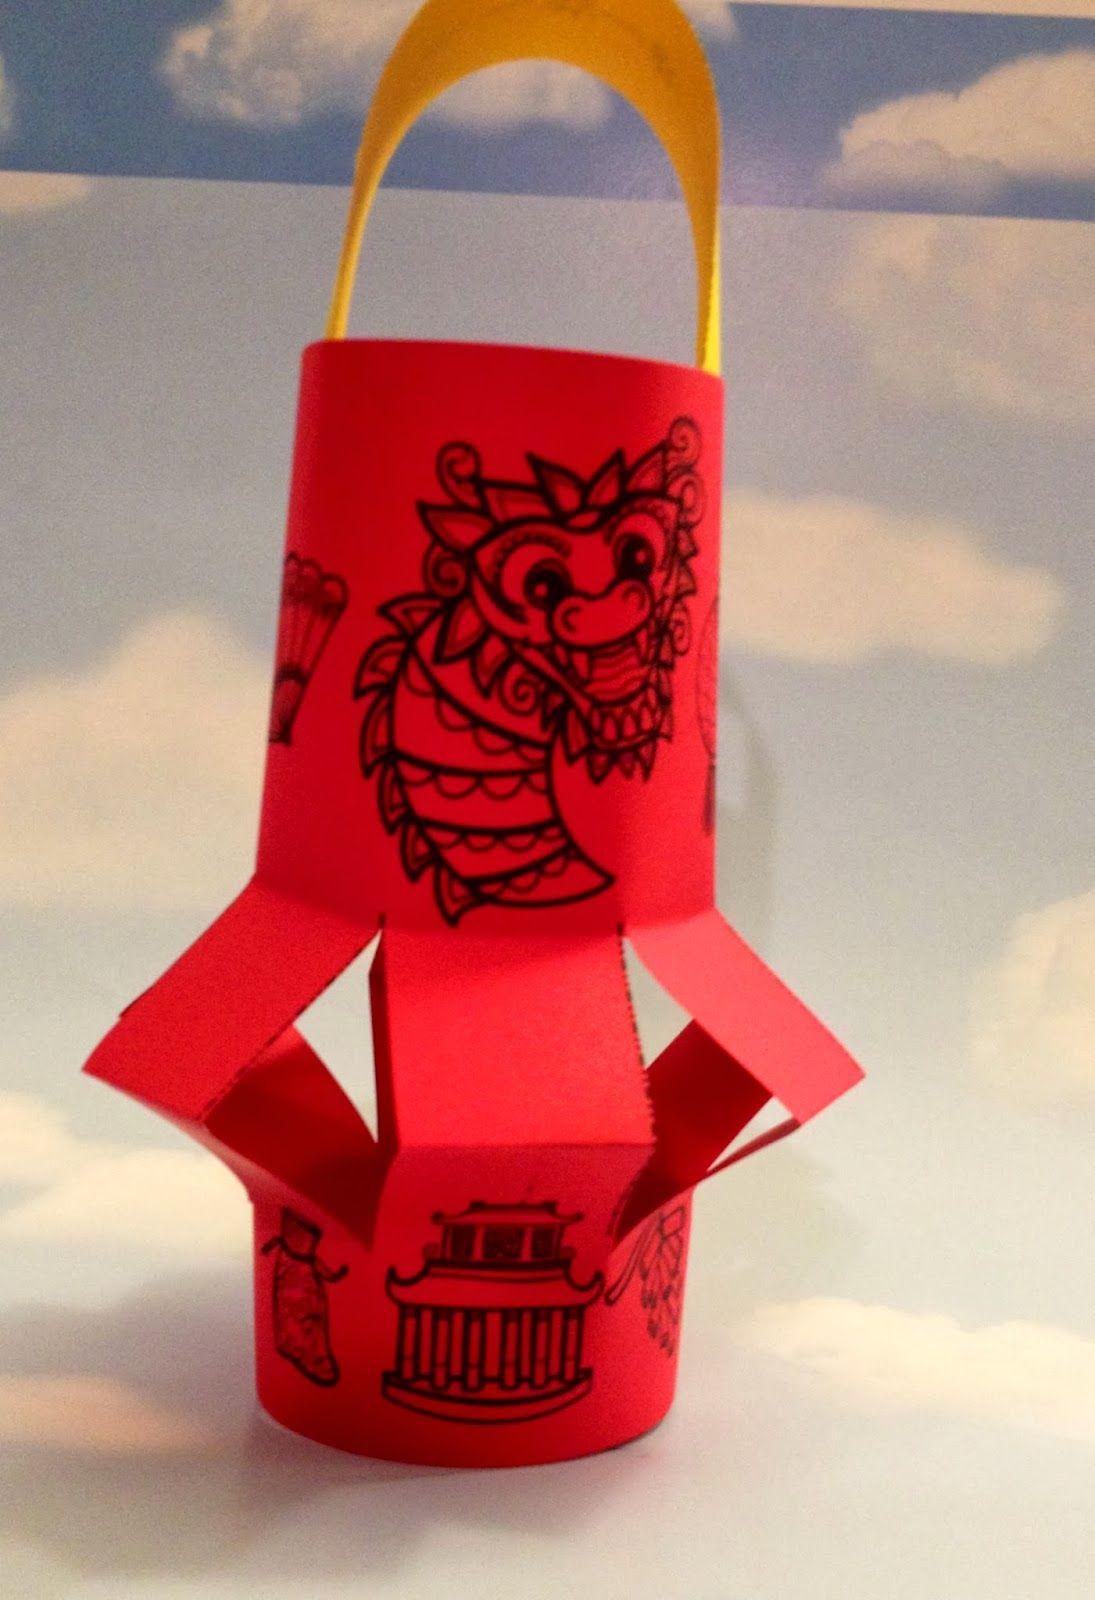 Chinese New Year Lantern For Kids